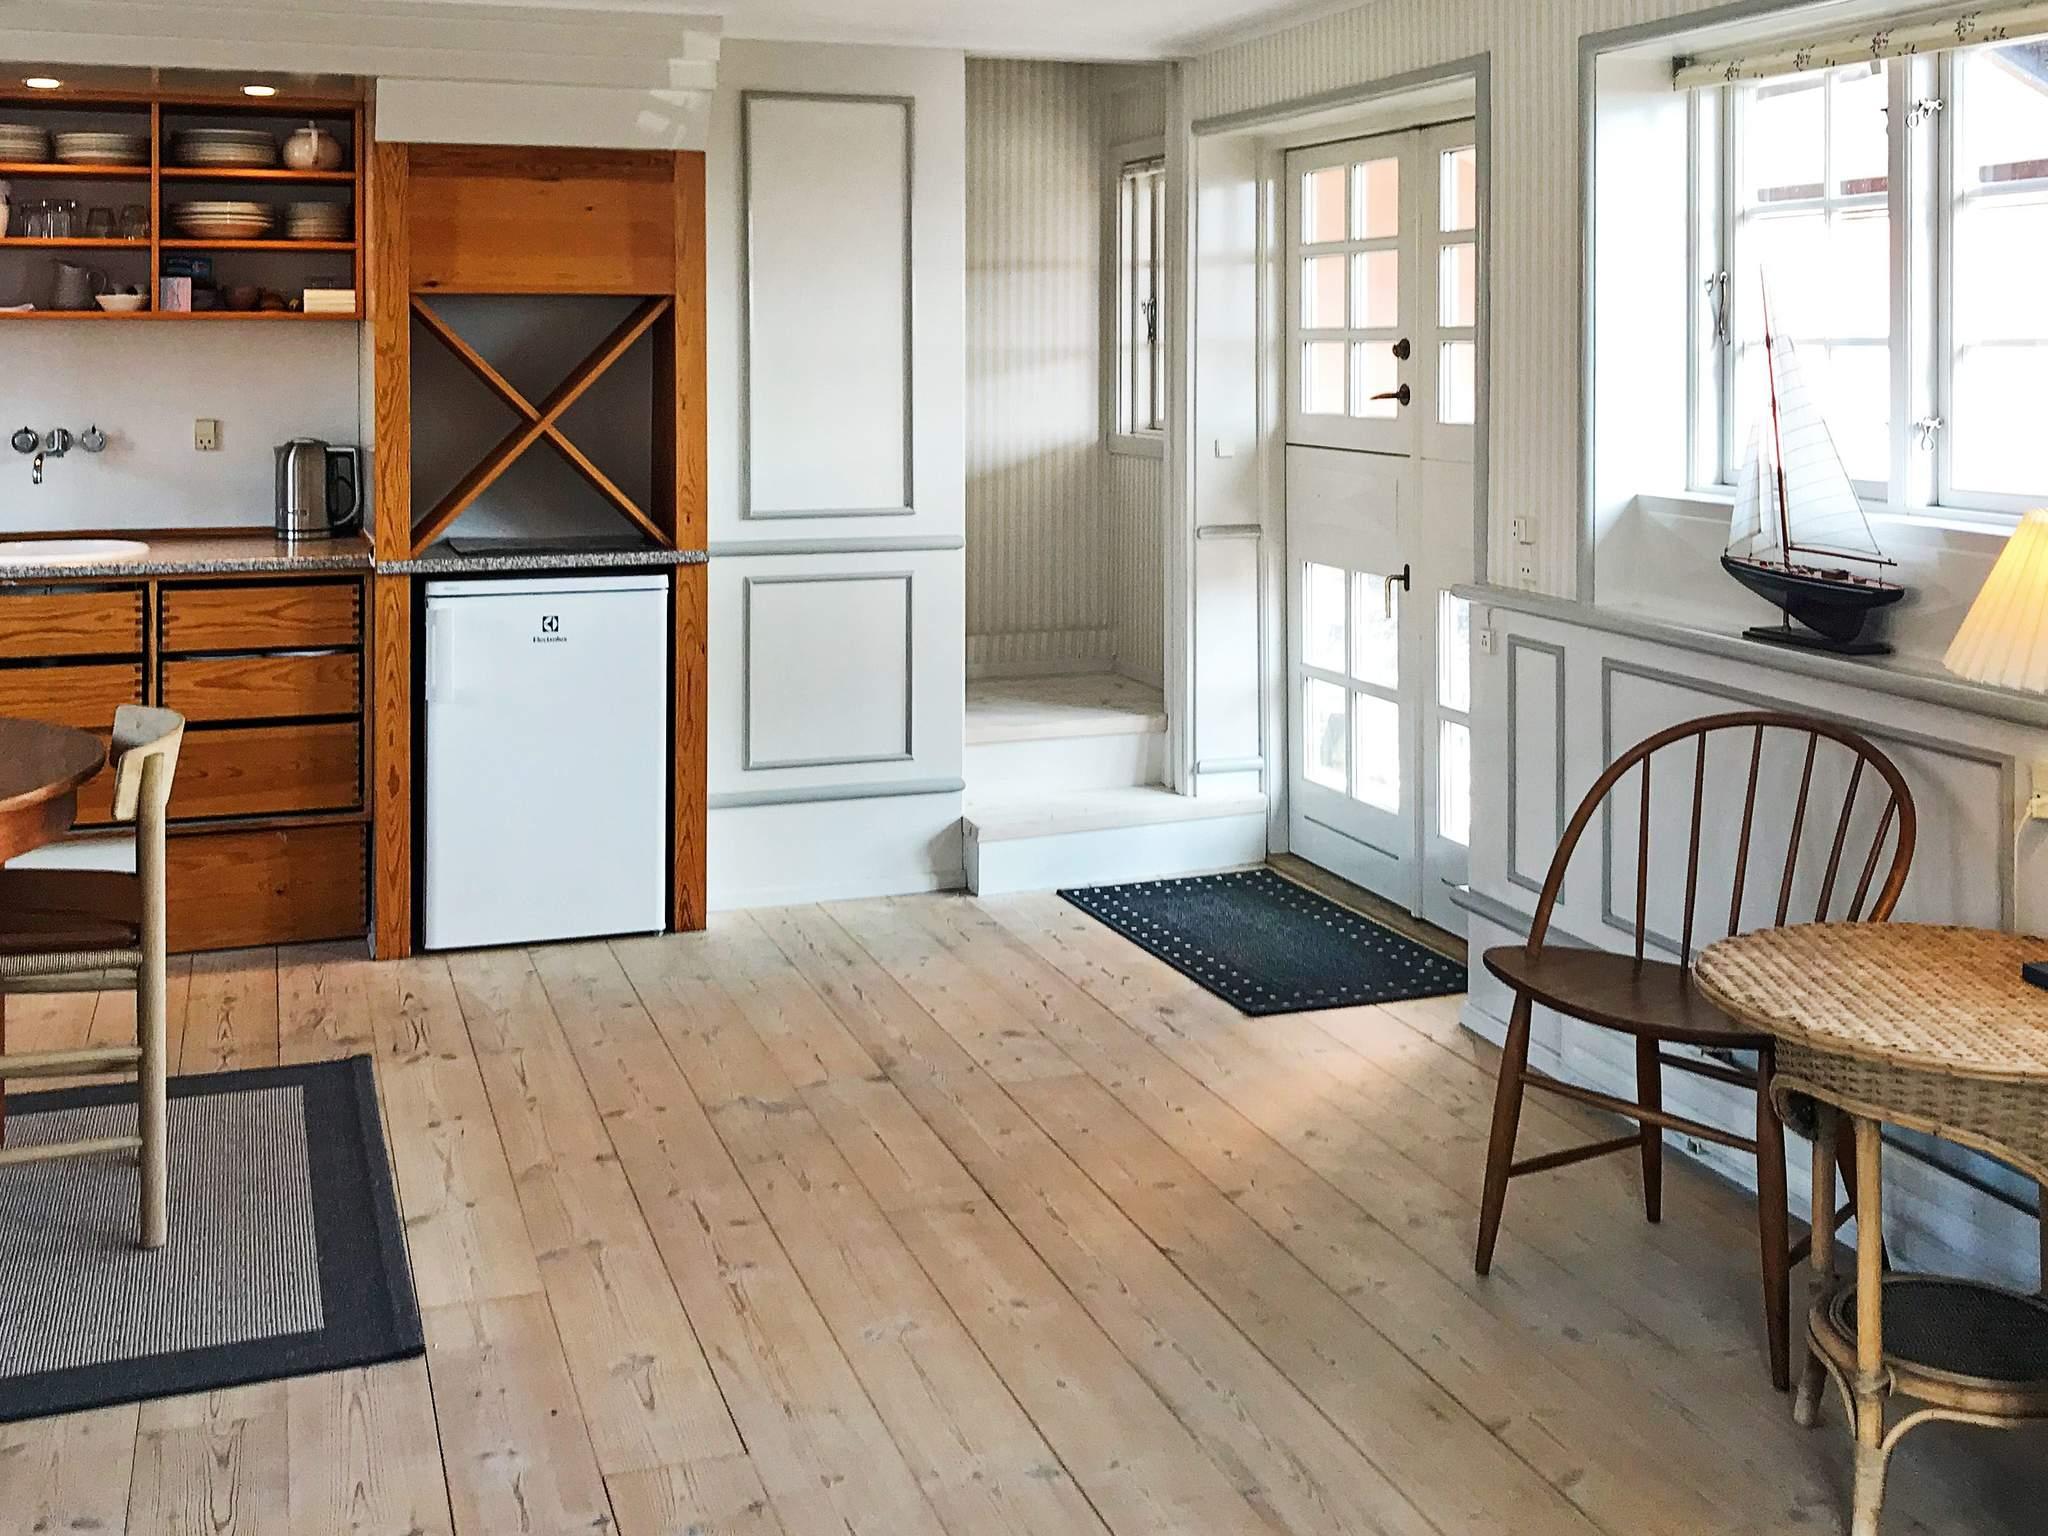 Maison de vacances Svaneke (82259), Svaneke, , Bornholm, Danemark, image 5